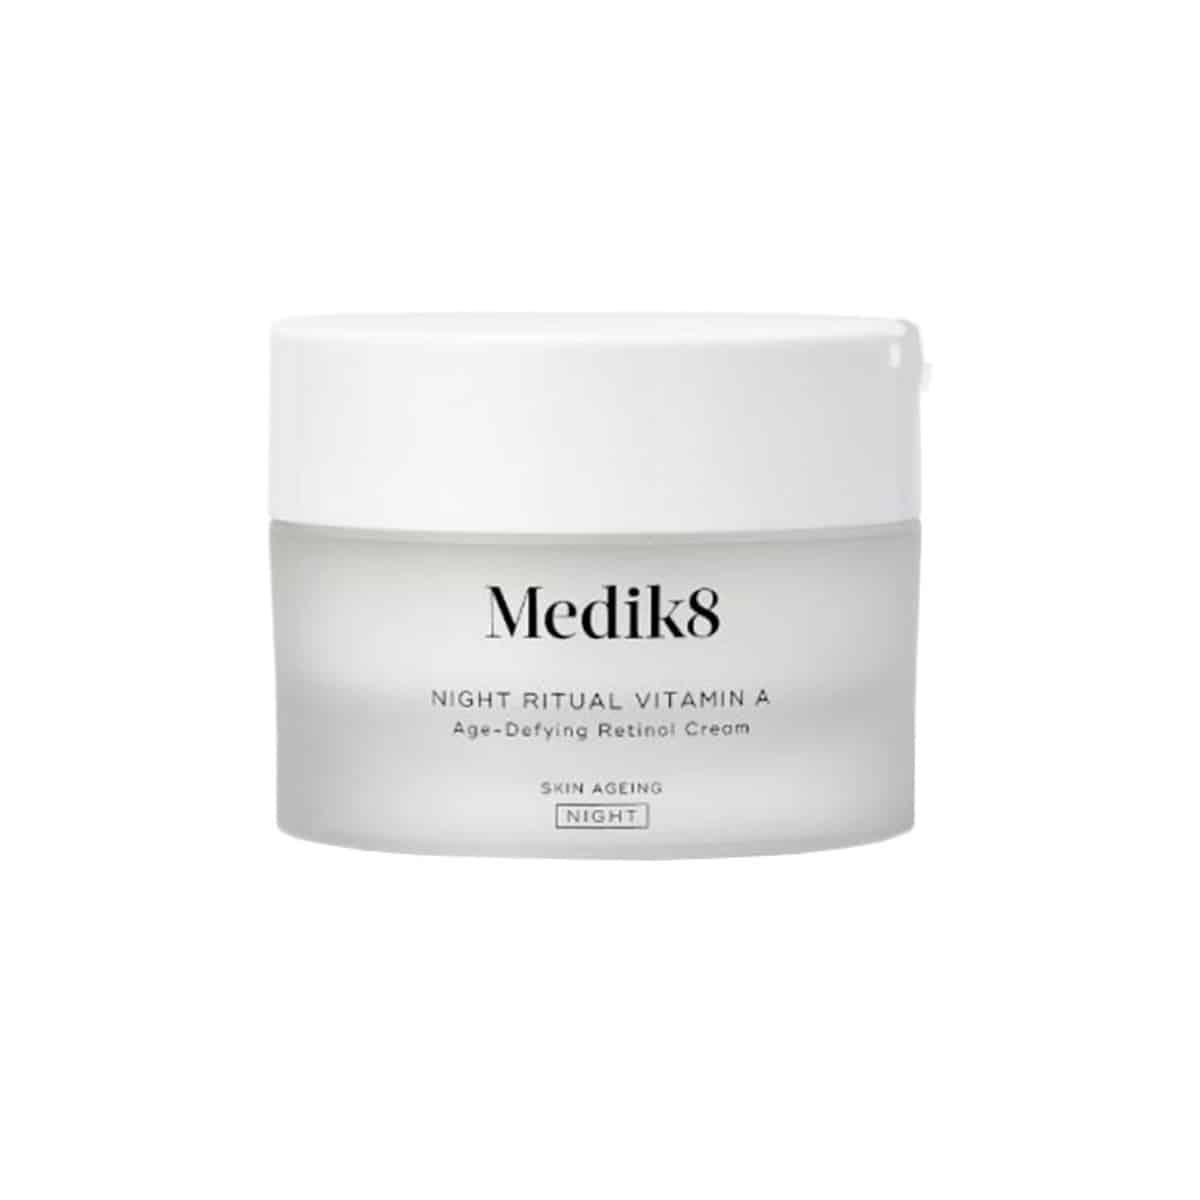 Medik8 Night Ritual Vitamin A Ireland